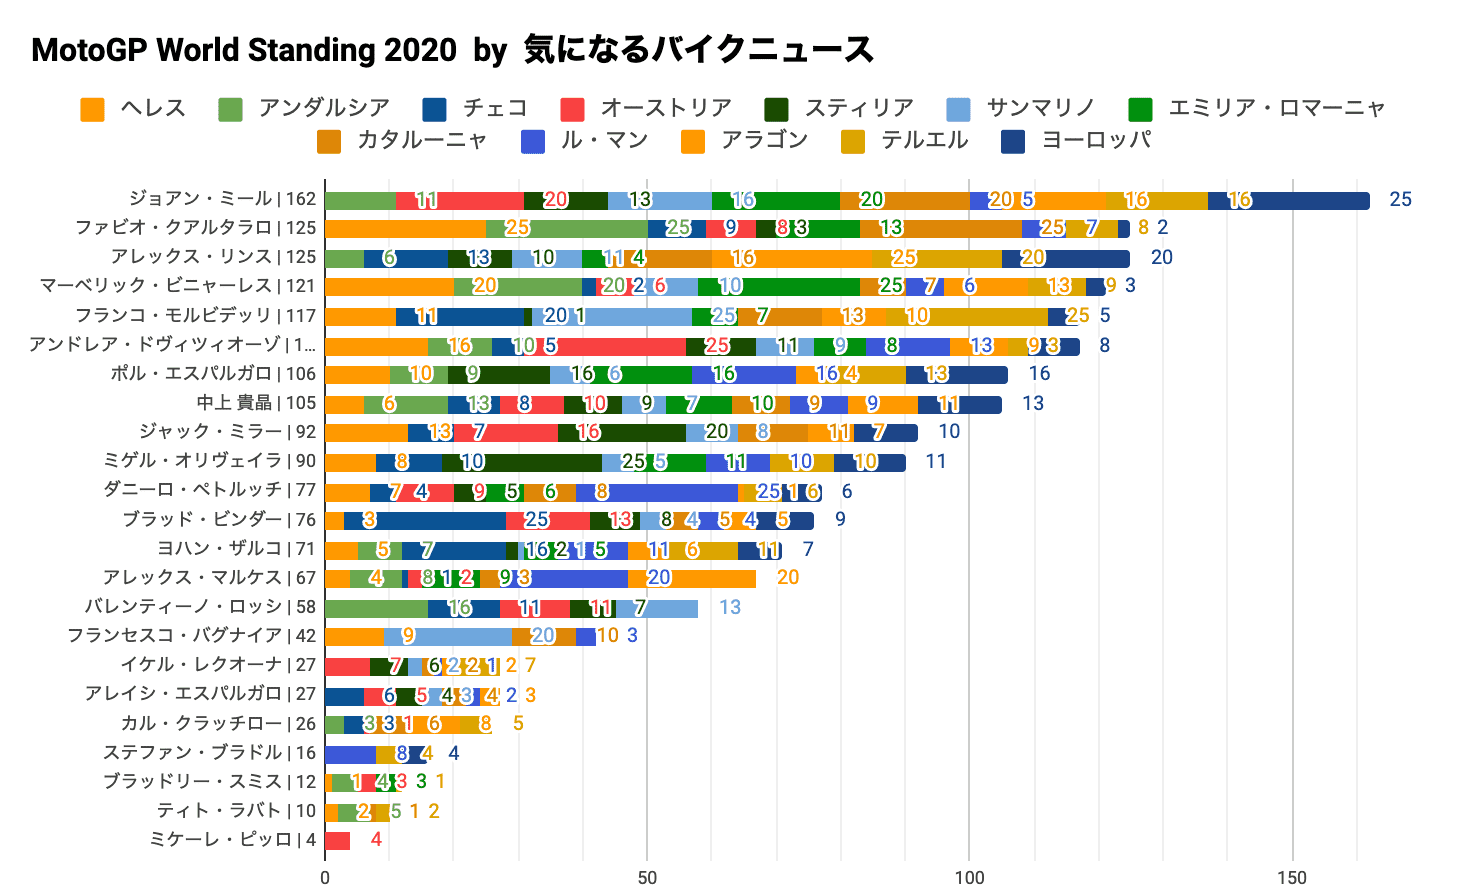 MotoGP2020チャンピオンシップ・スタンディング(2020/11/08時点)